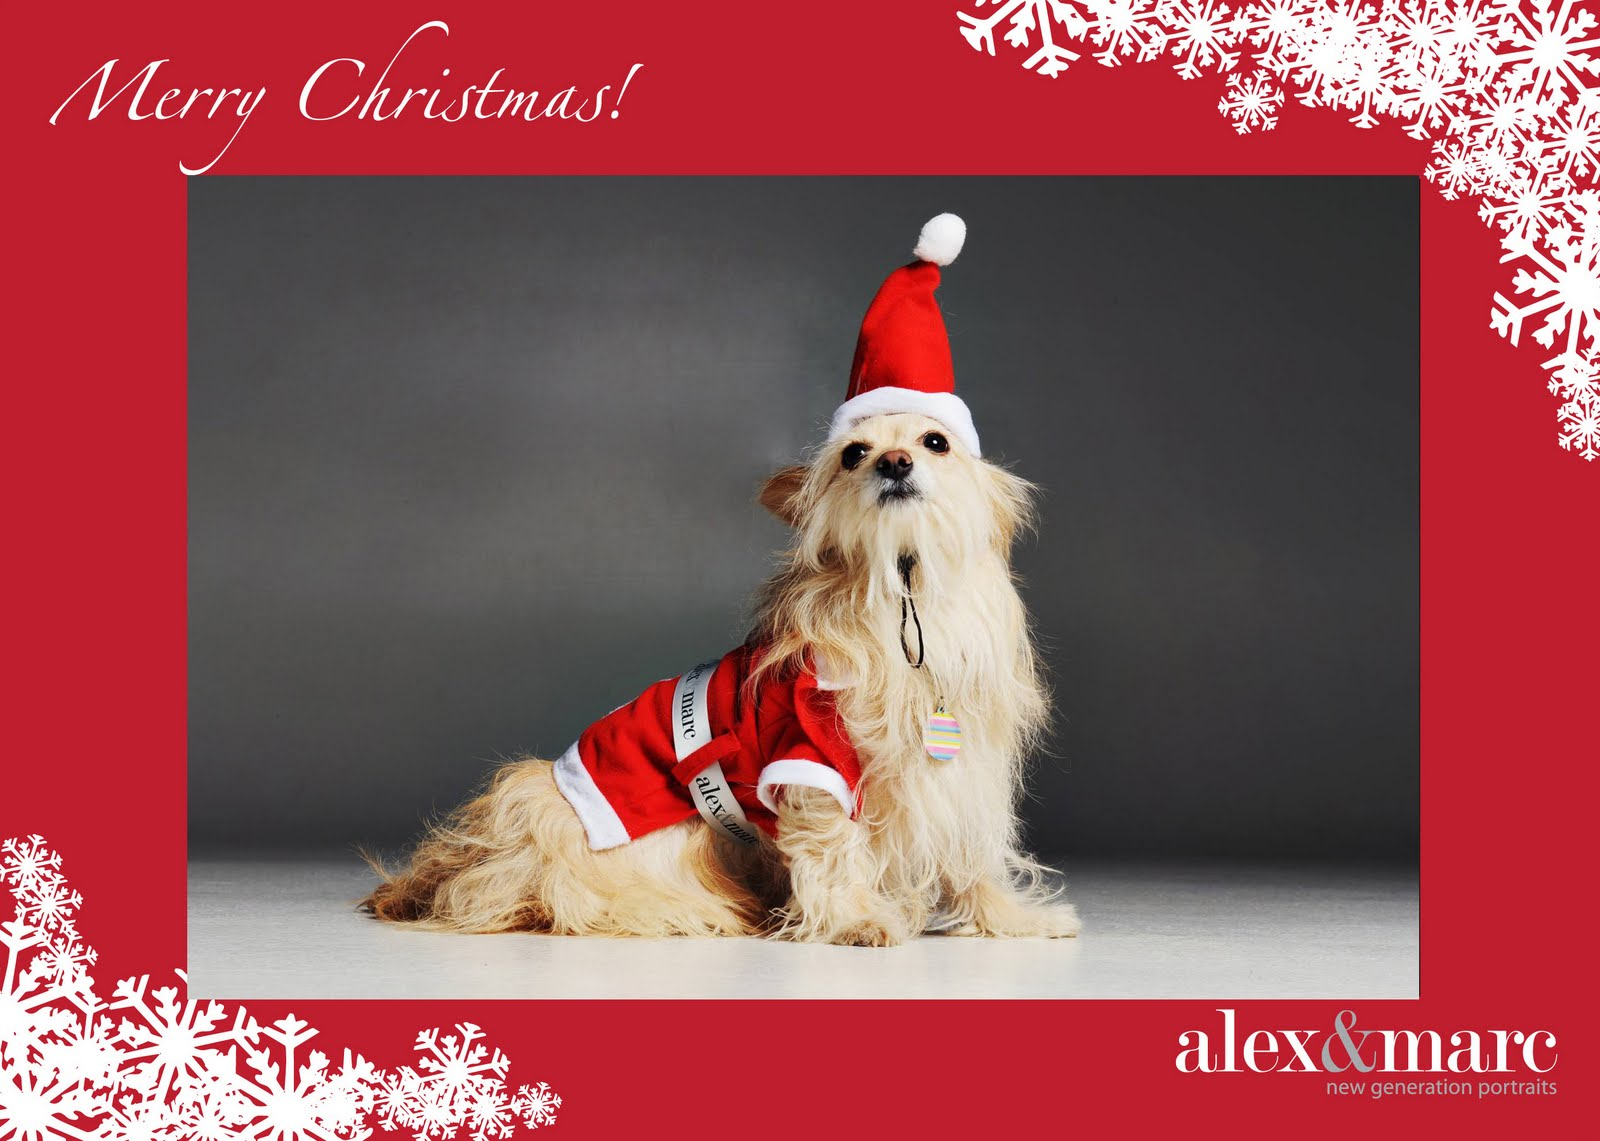 alex&marc new generation portraits: Christmas Pet Portraits